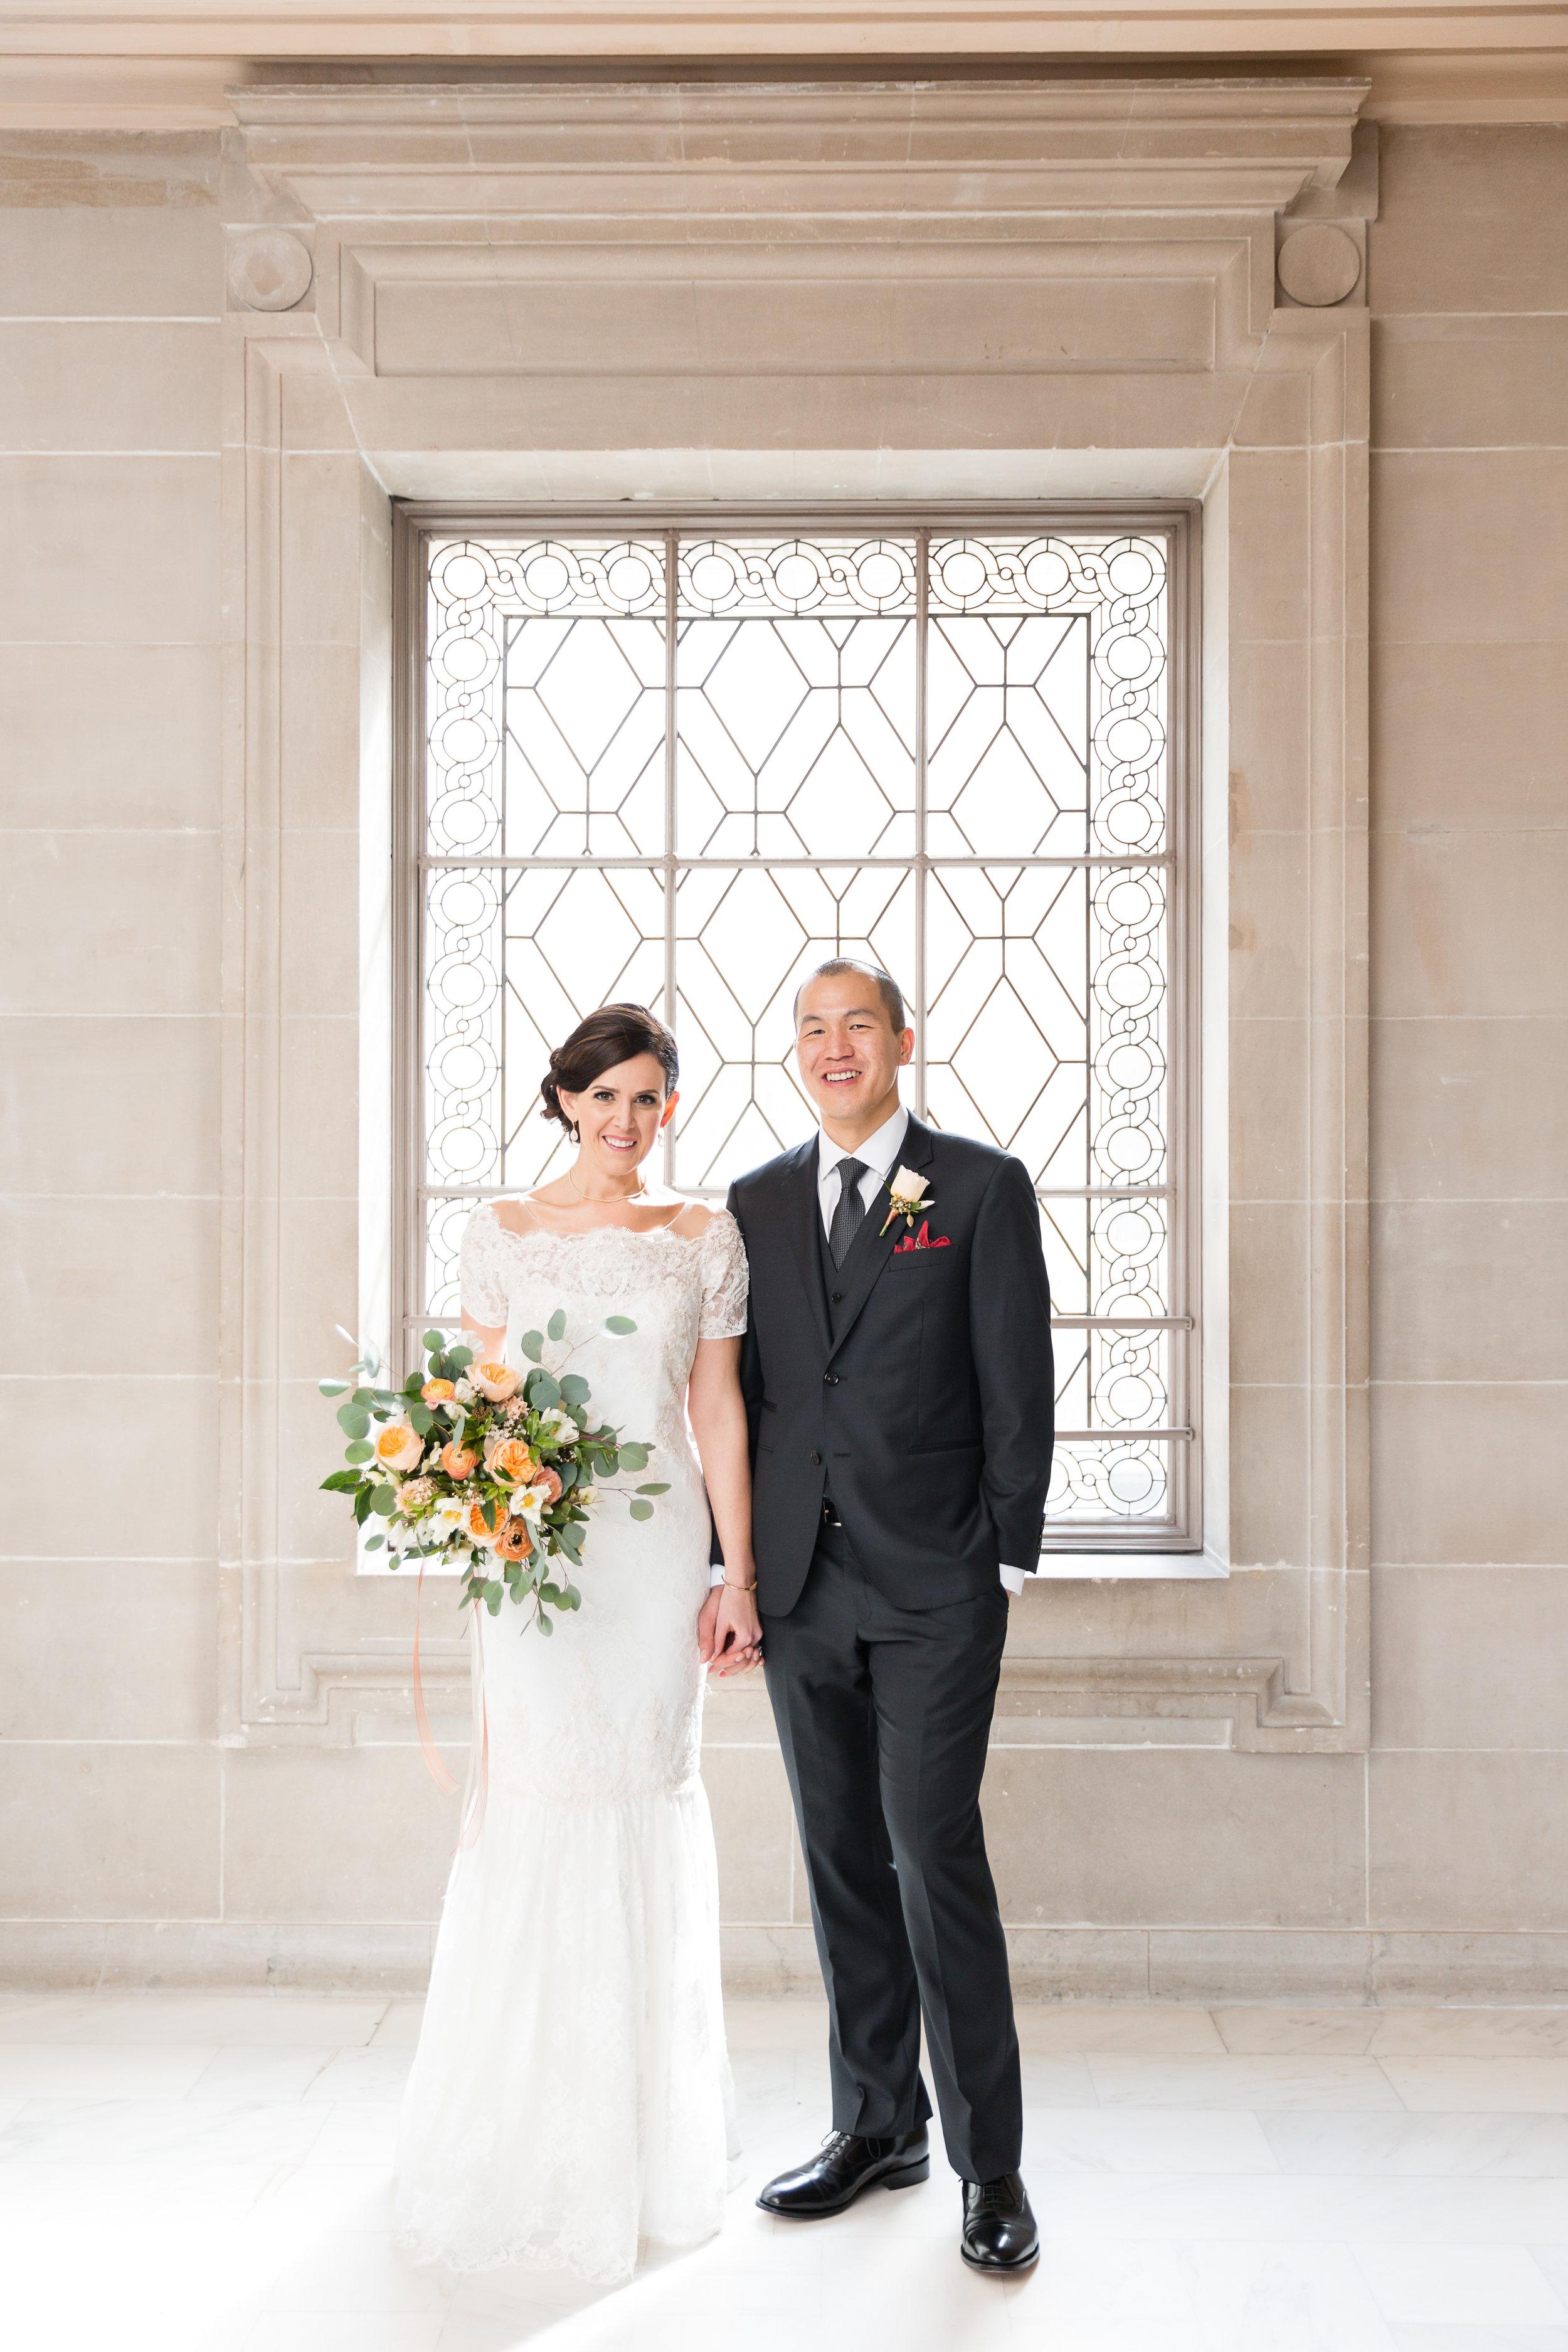 Liz-Henry-Forge-Oakland-Wedding-98.jpg